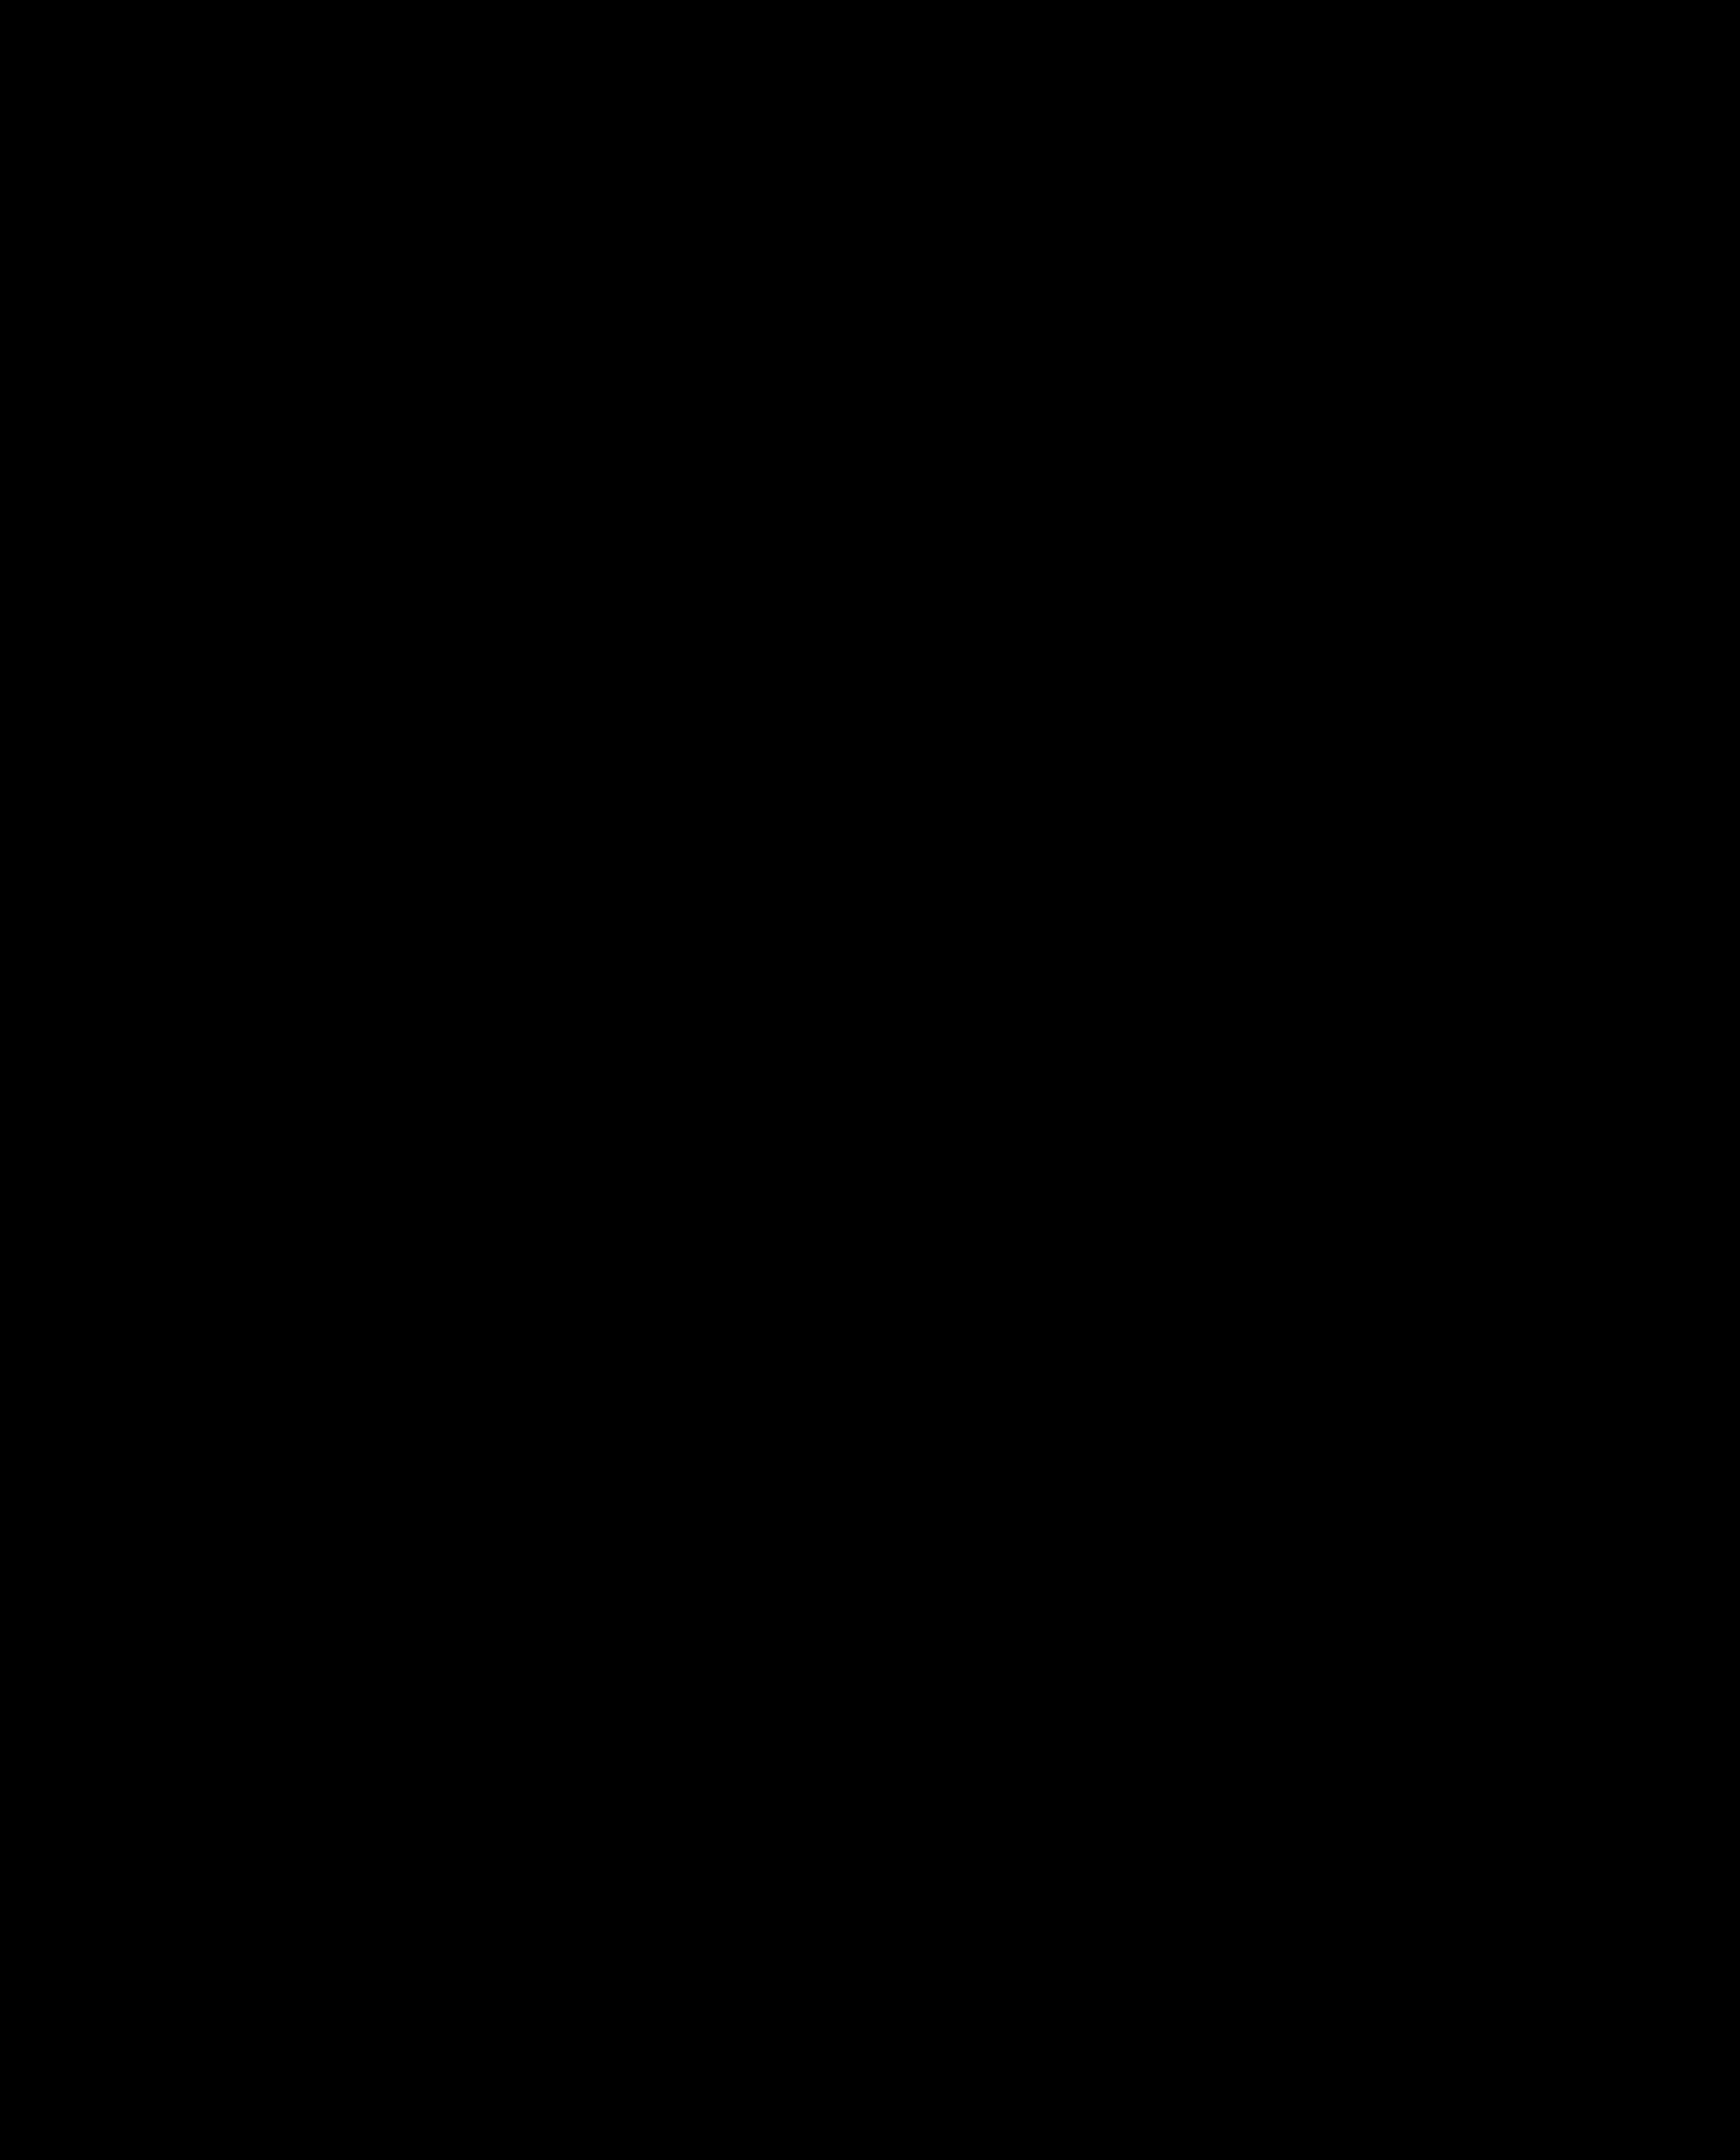 3827x4754 Ship Silhouette Clipart